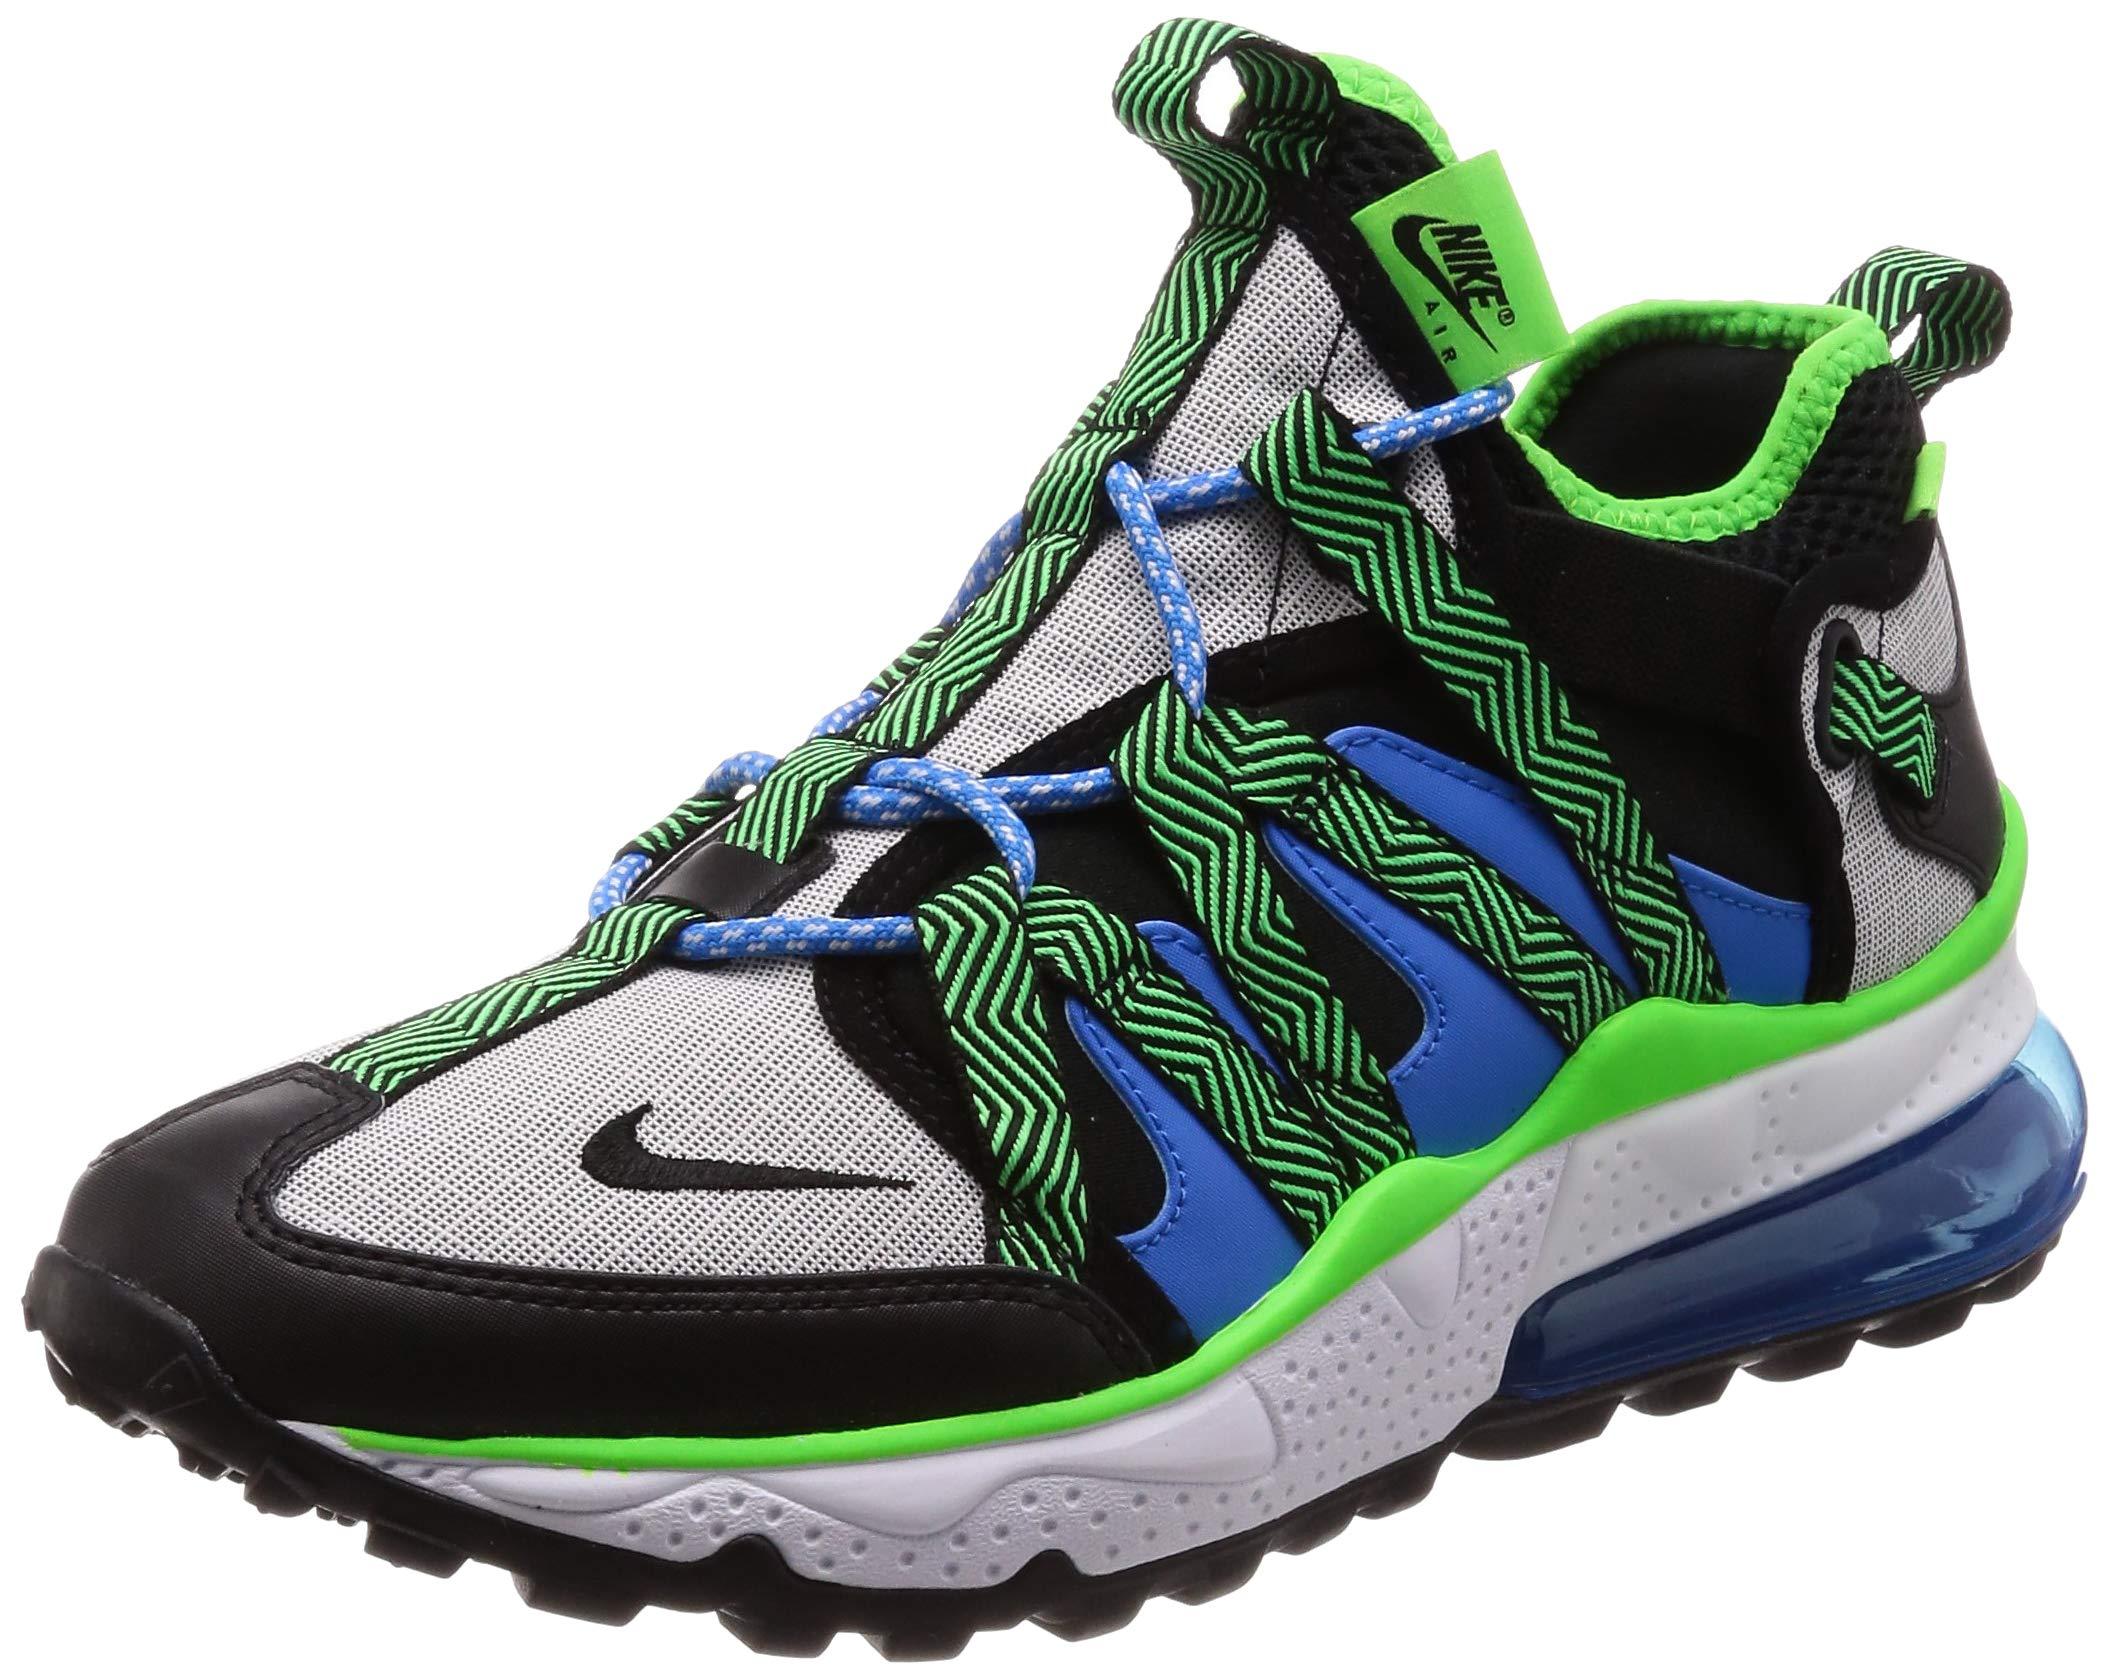 eae8242e75f Galleon - Nike Men s Air Max 270 Bowfin Black Black Phantom Photo Blue Mesh  Running Shoes 11.5 M US